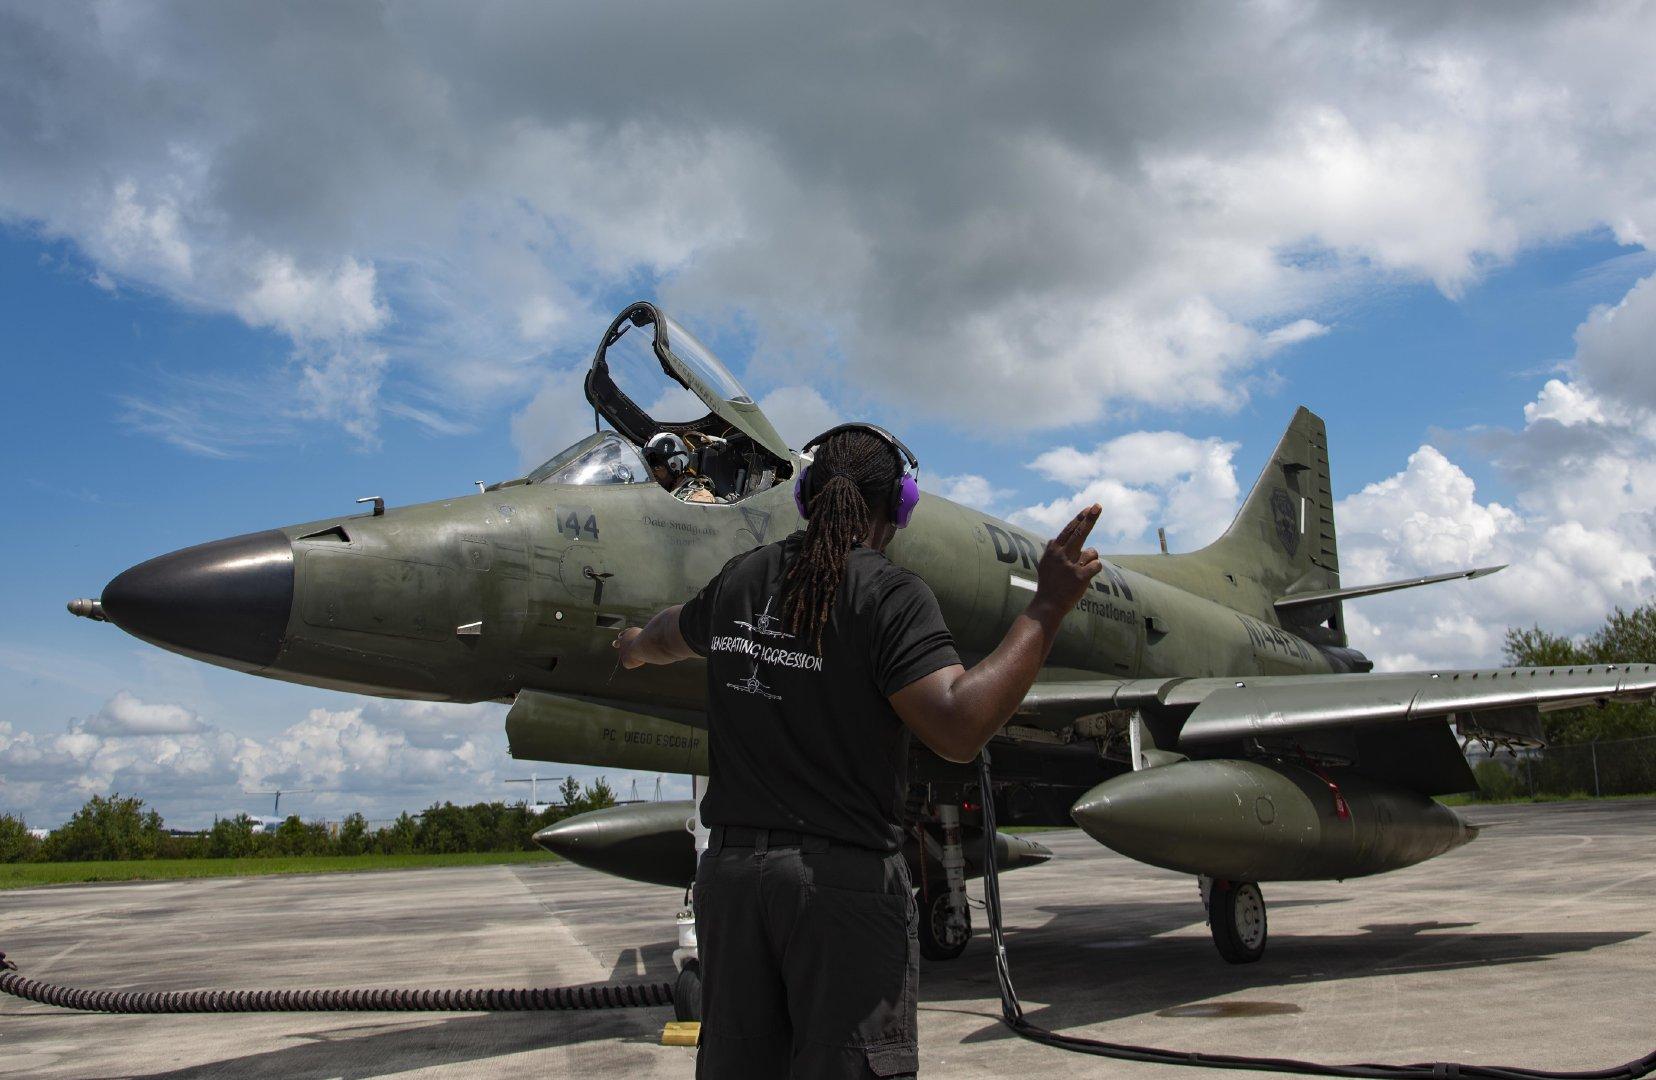 Draken国际飞行员Greg Cloer准备于2020年9月11日在北卡罗来纳州金斯